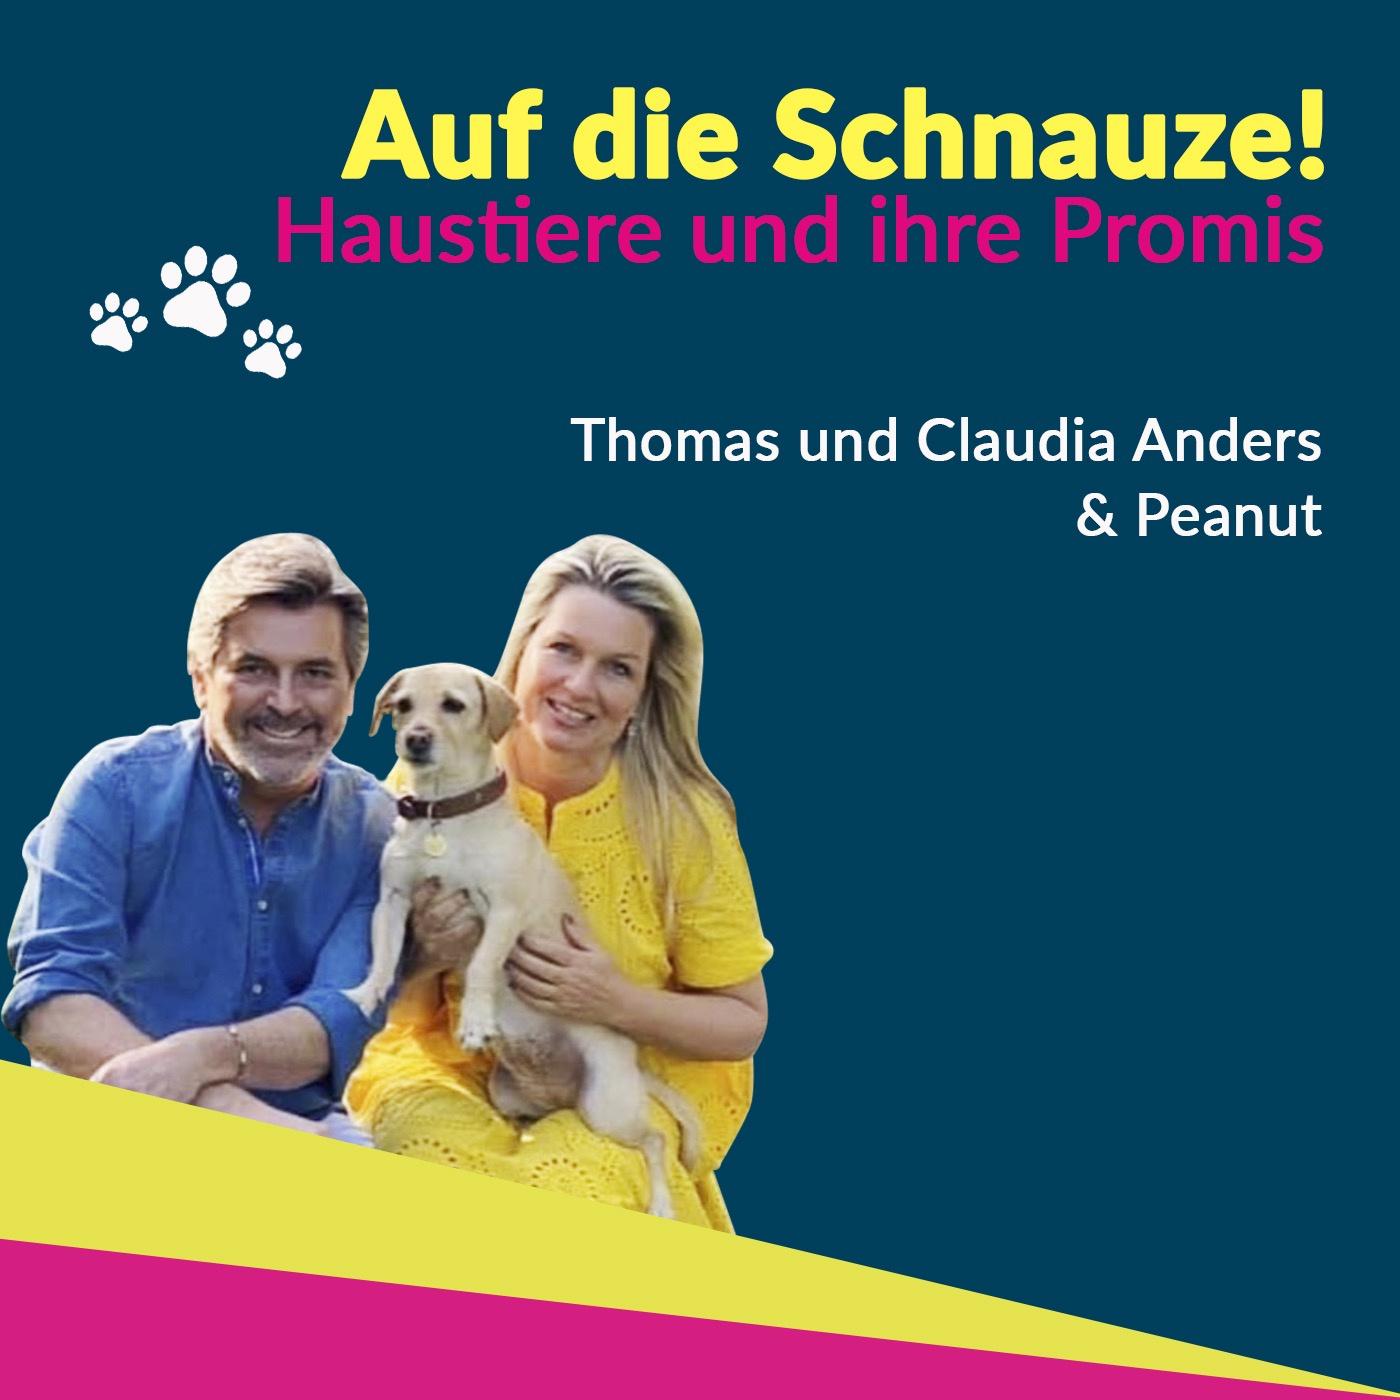 Claudia & Thomas Anders - it comes naturally!